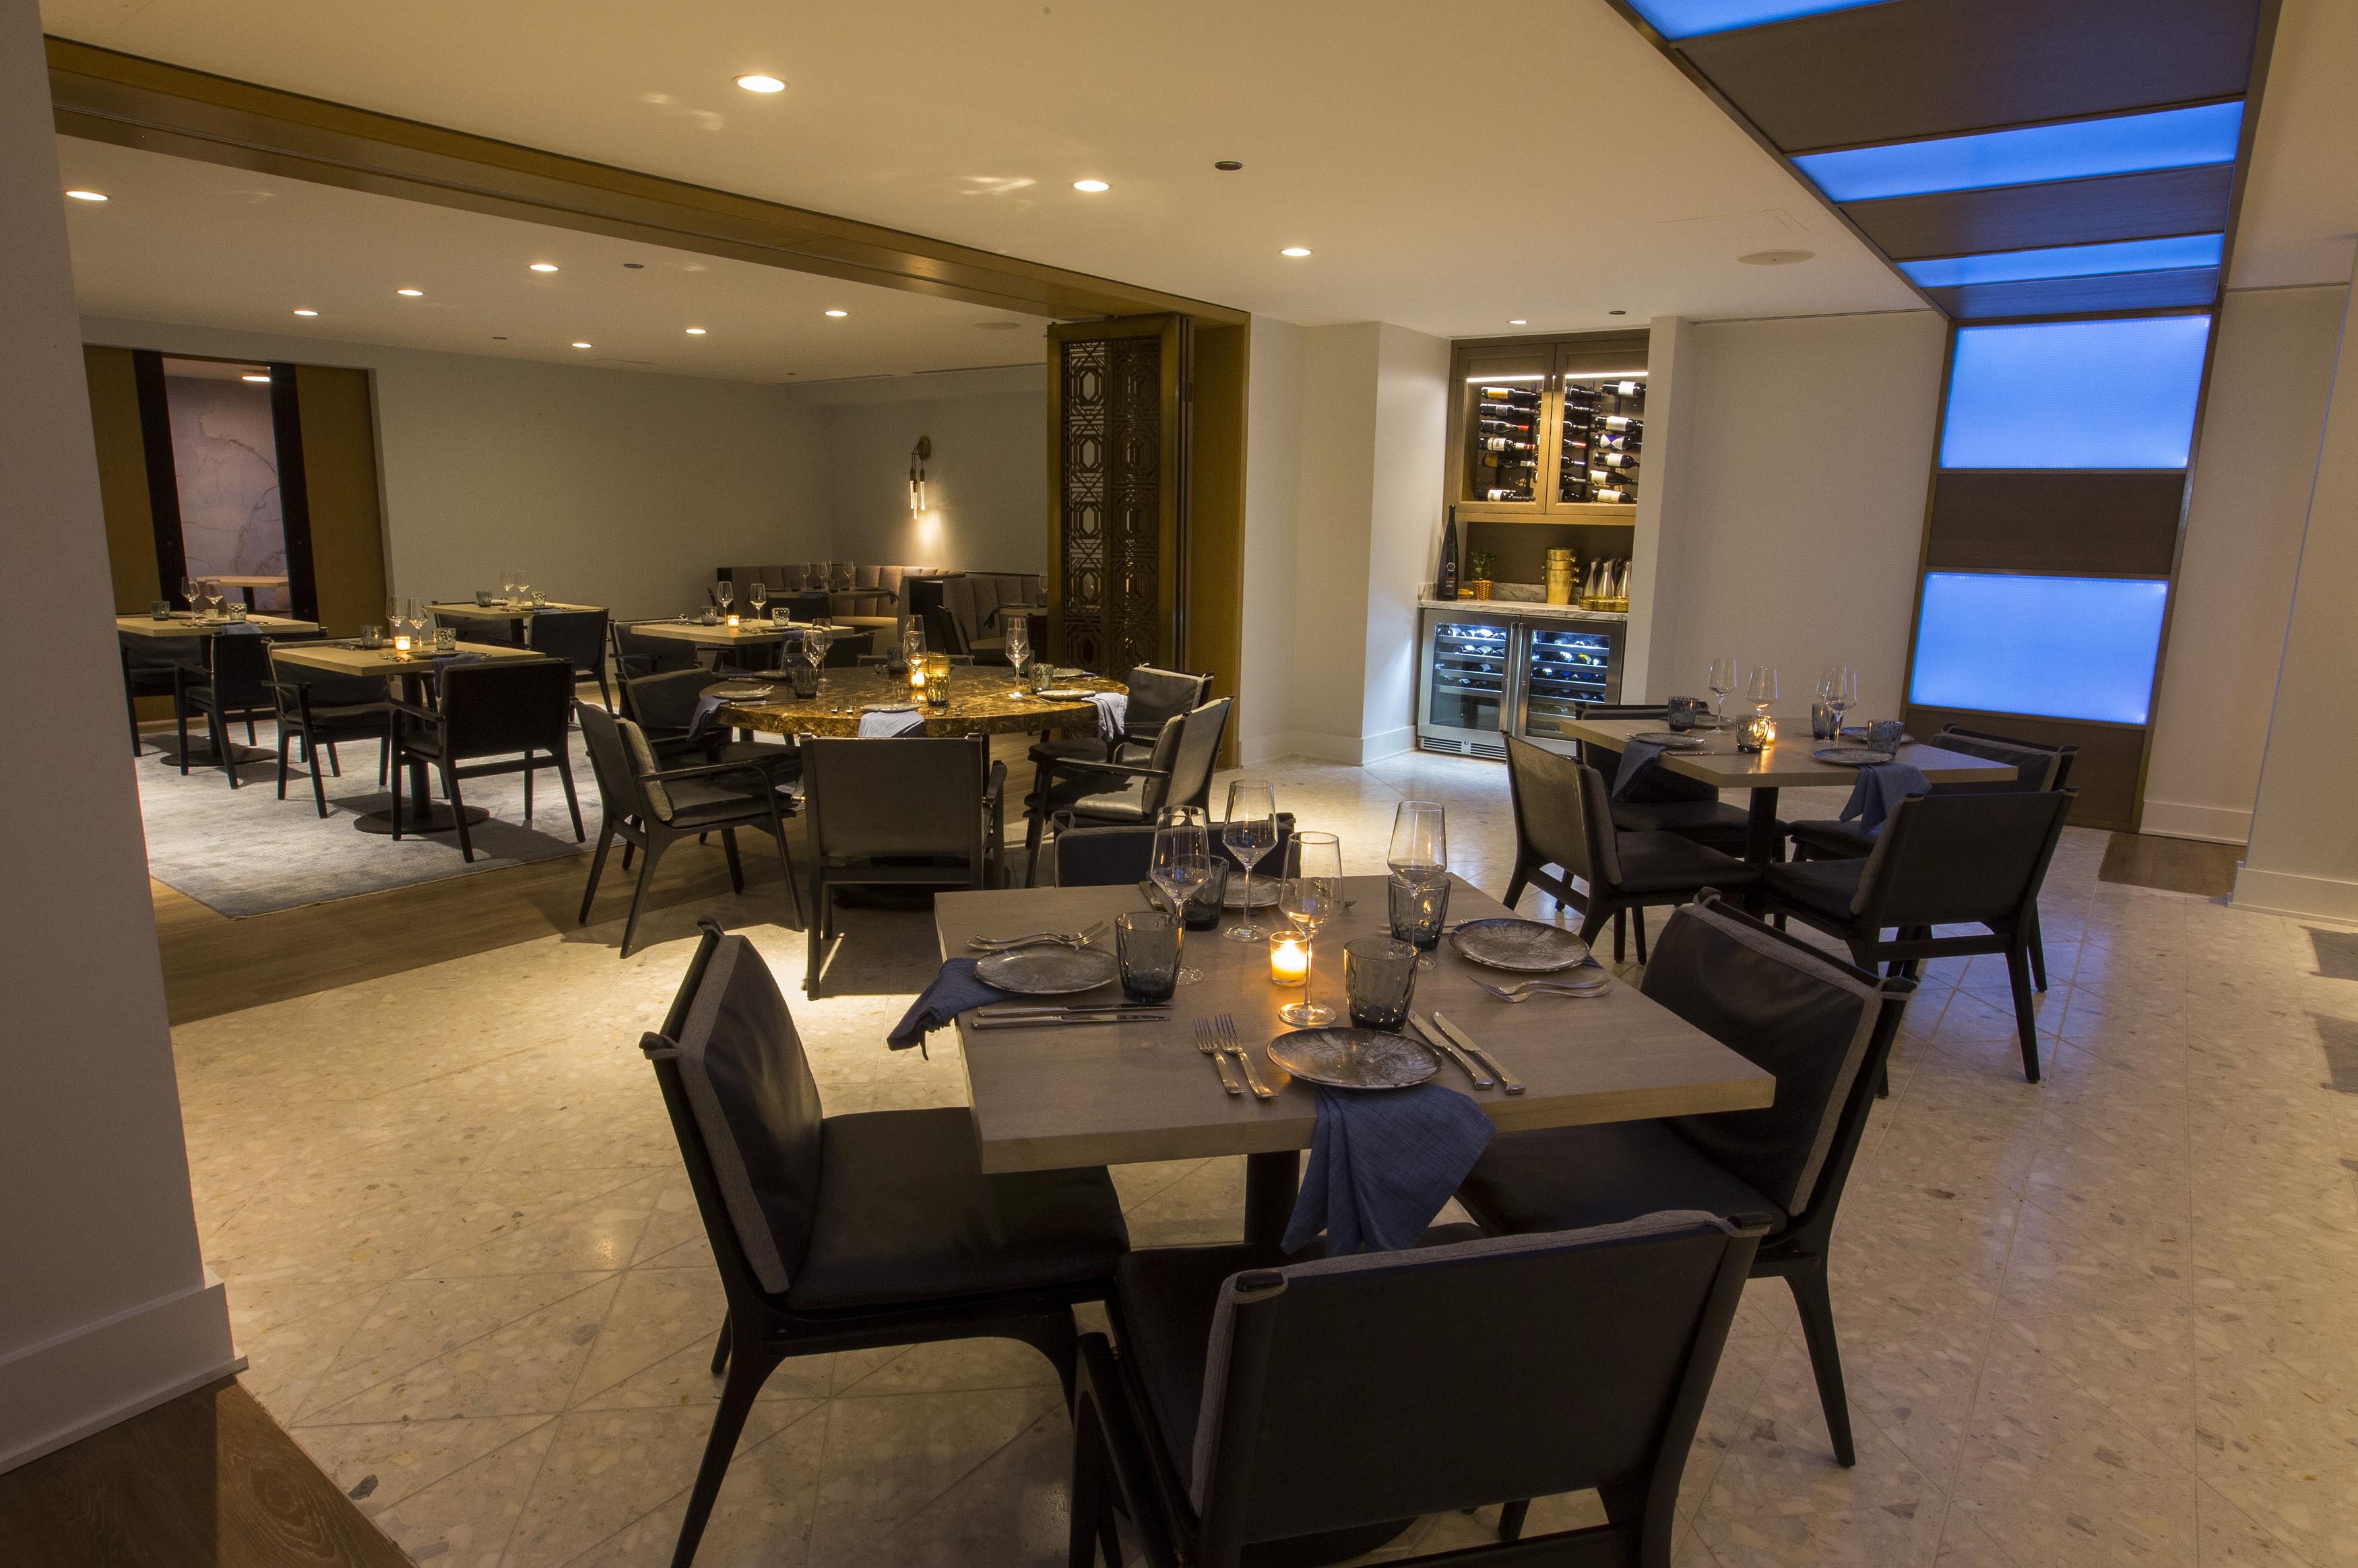 A dining room with a custom light fixture overhead.